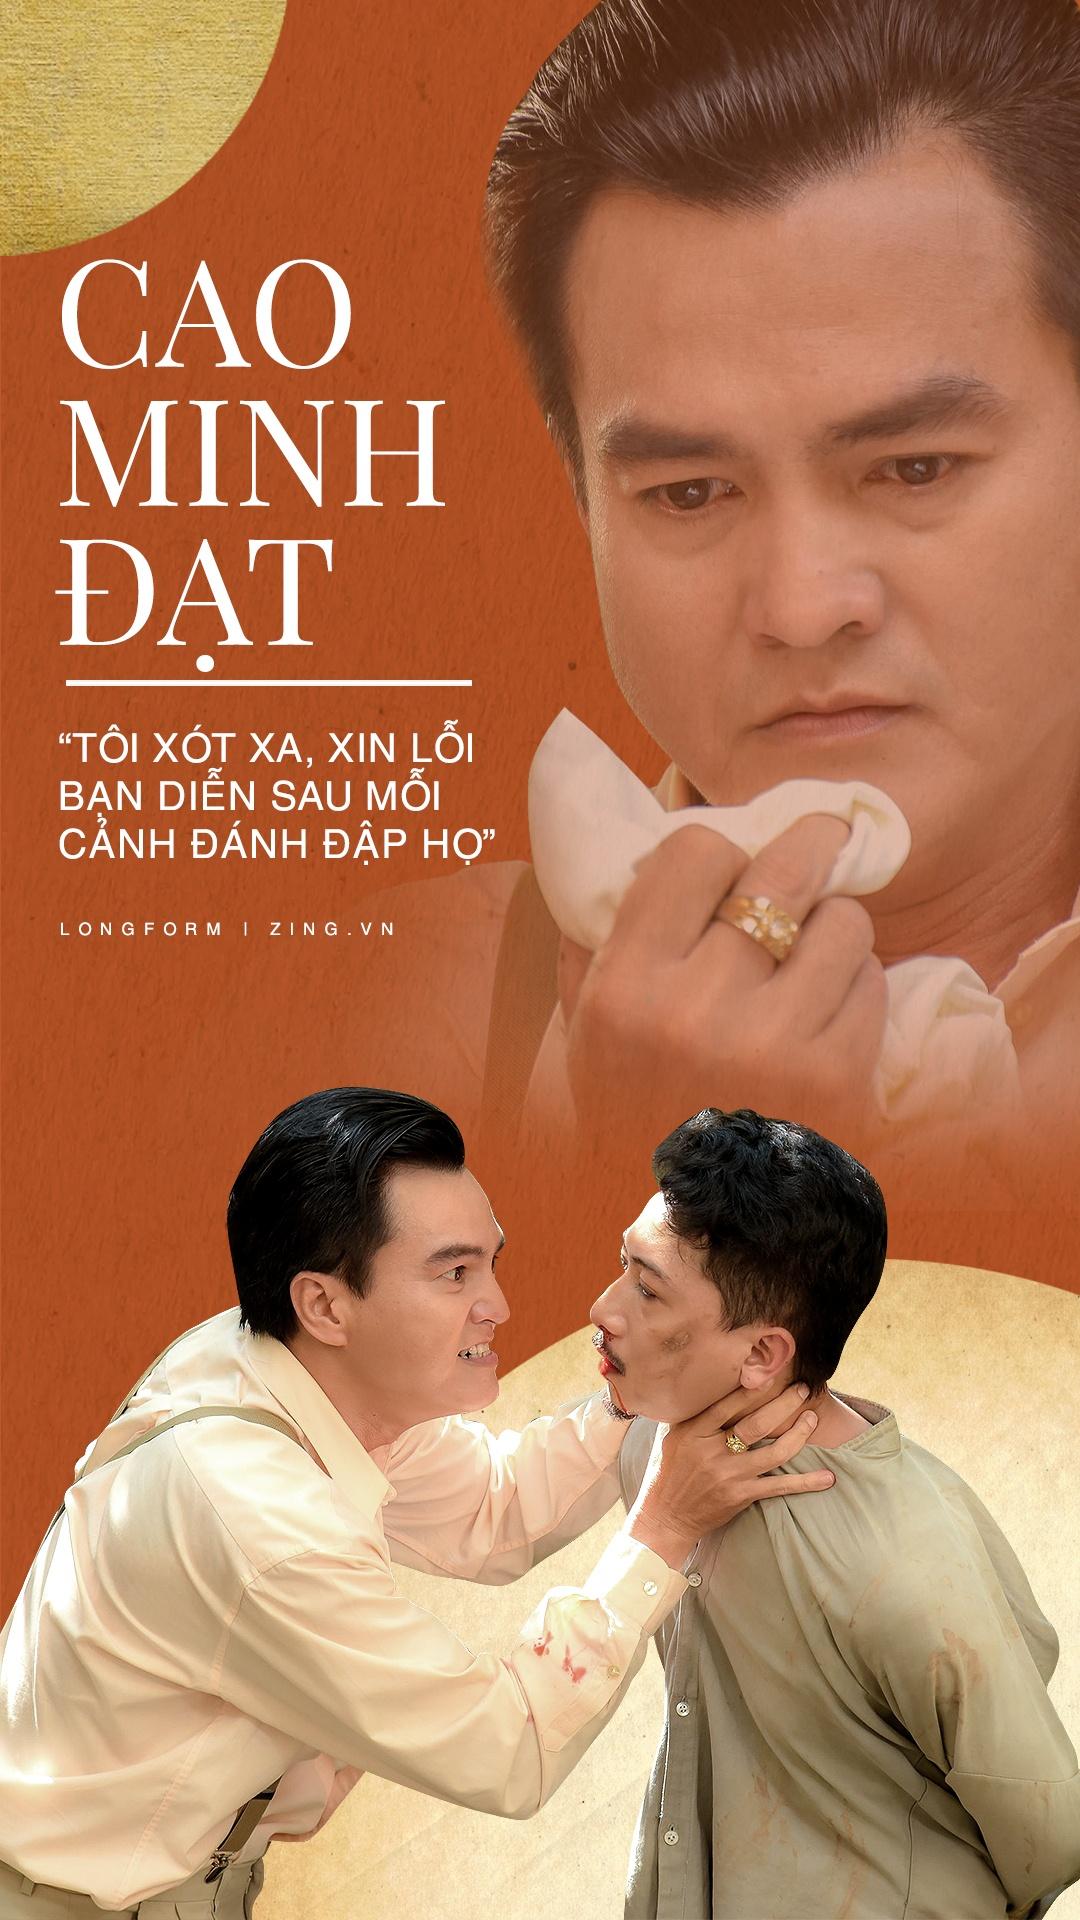 Cao Minh Dat: 'Toi xot xa, xin loi ban dien sau moi canh danh dap ho' hinh anh 1